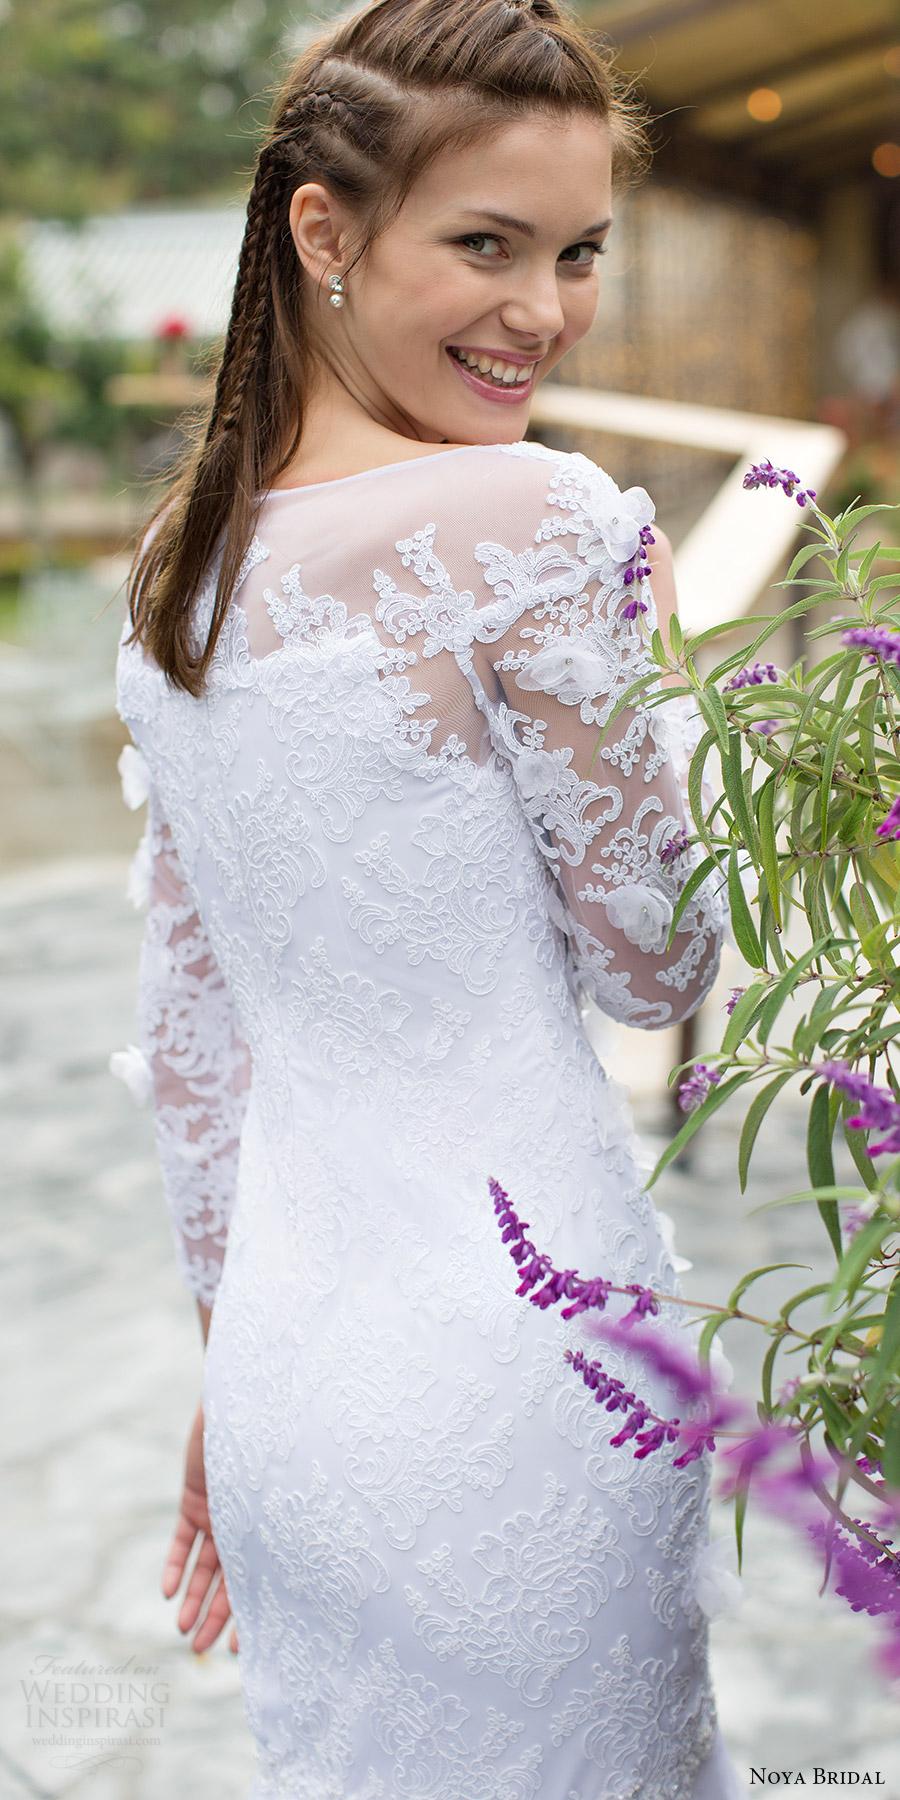 "Noya Bridal ""Aria"" Collection Wedding Dresses | Wedding Inspirasi"